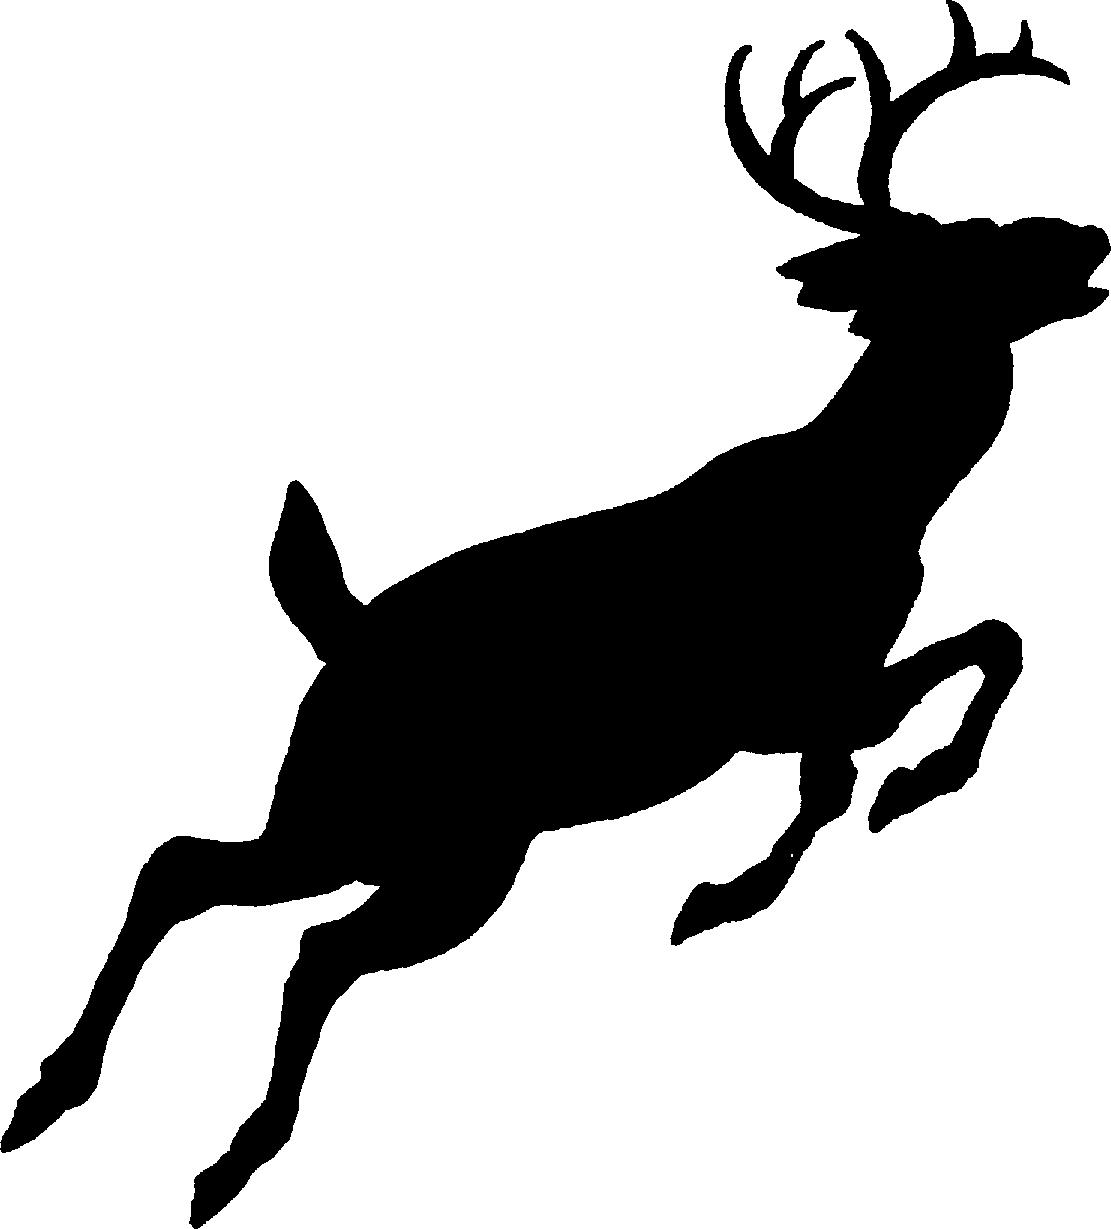 Whitetail Deer Clipart U0026middot; Buck-Whitetail Deer Clipart u0026middot; buck clipart u0026middot; buck clipart-18